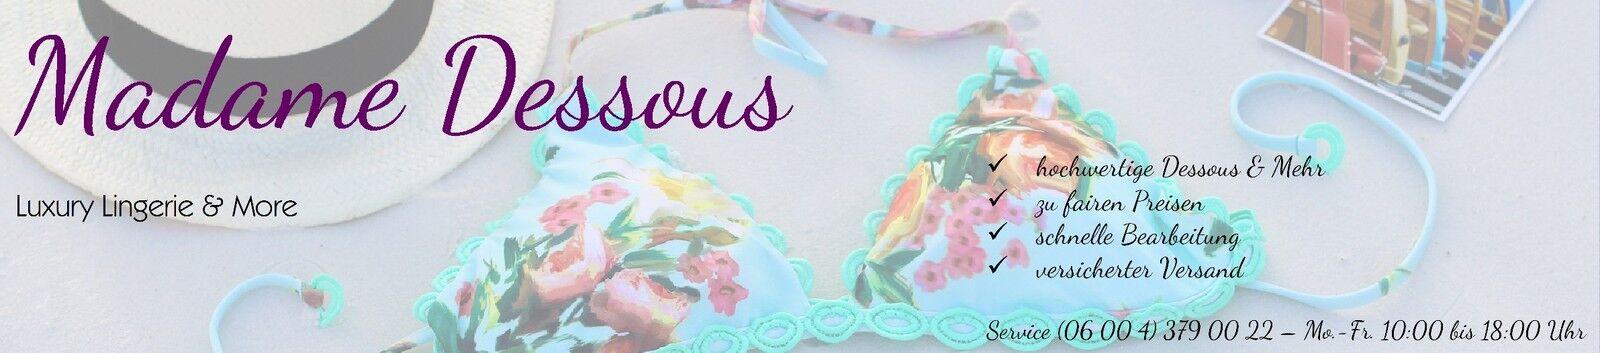 Madame Dessous Luxury Lingerie&More